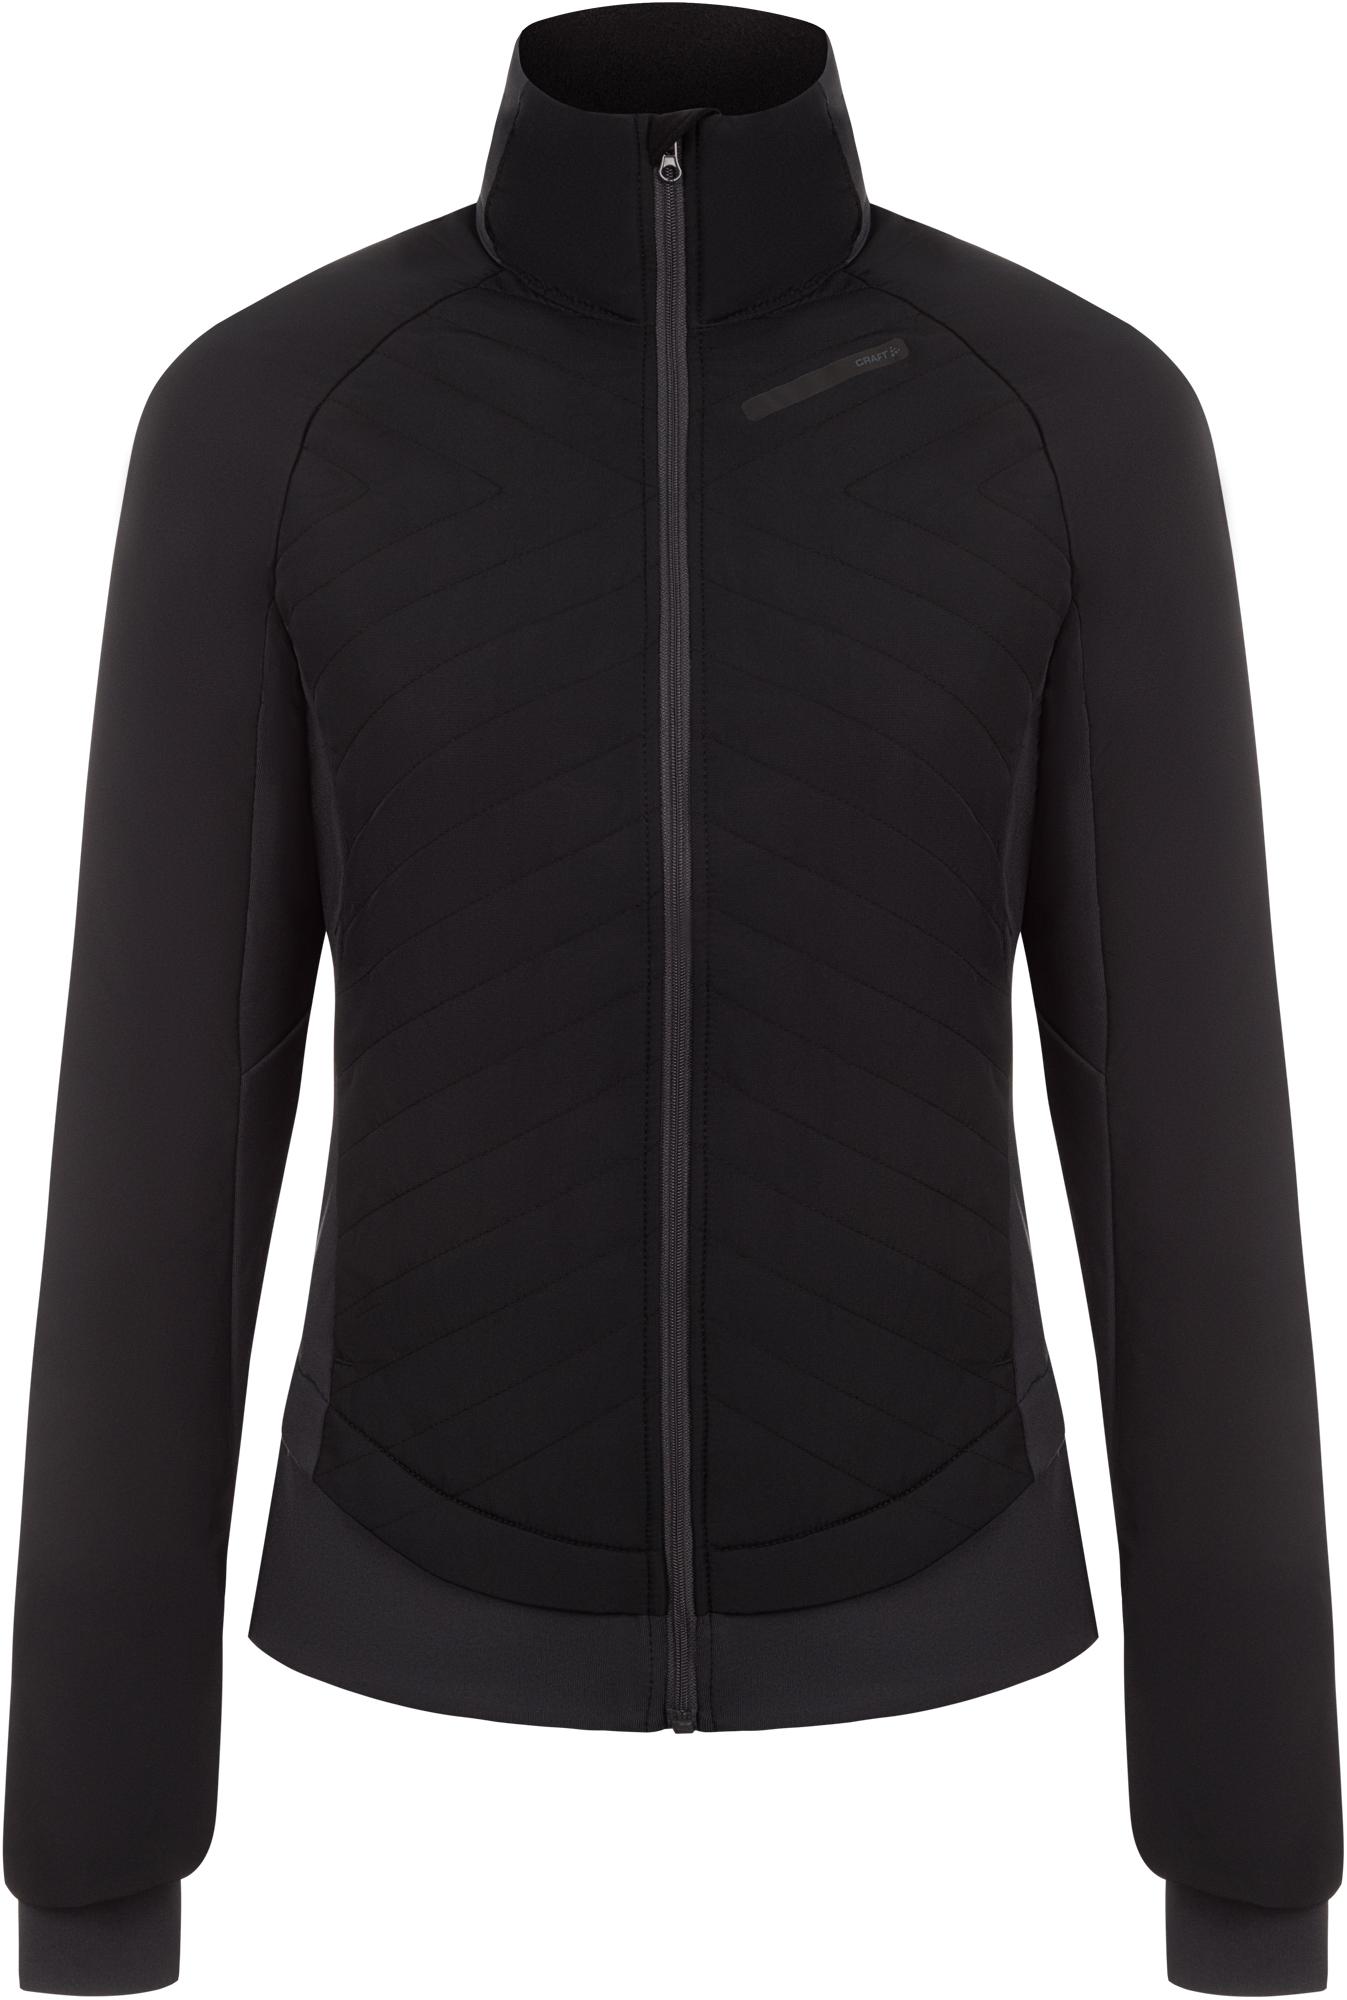 Craft Куртка женская Storm Thermal, размер 48-50